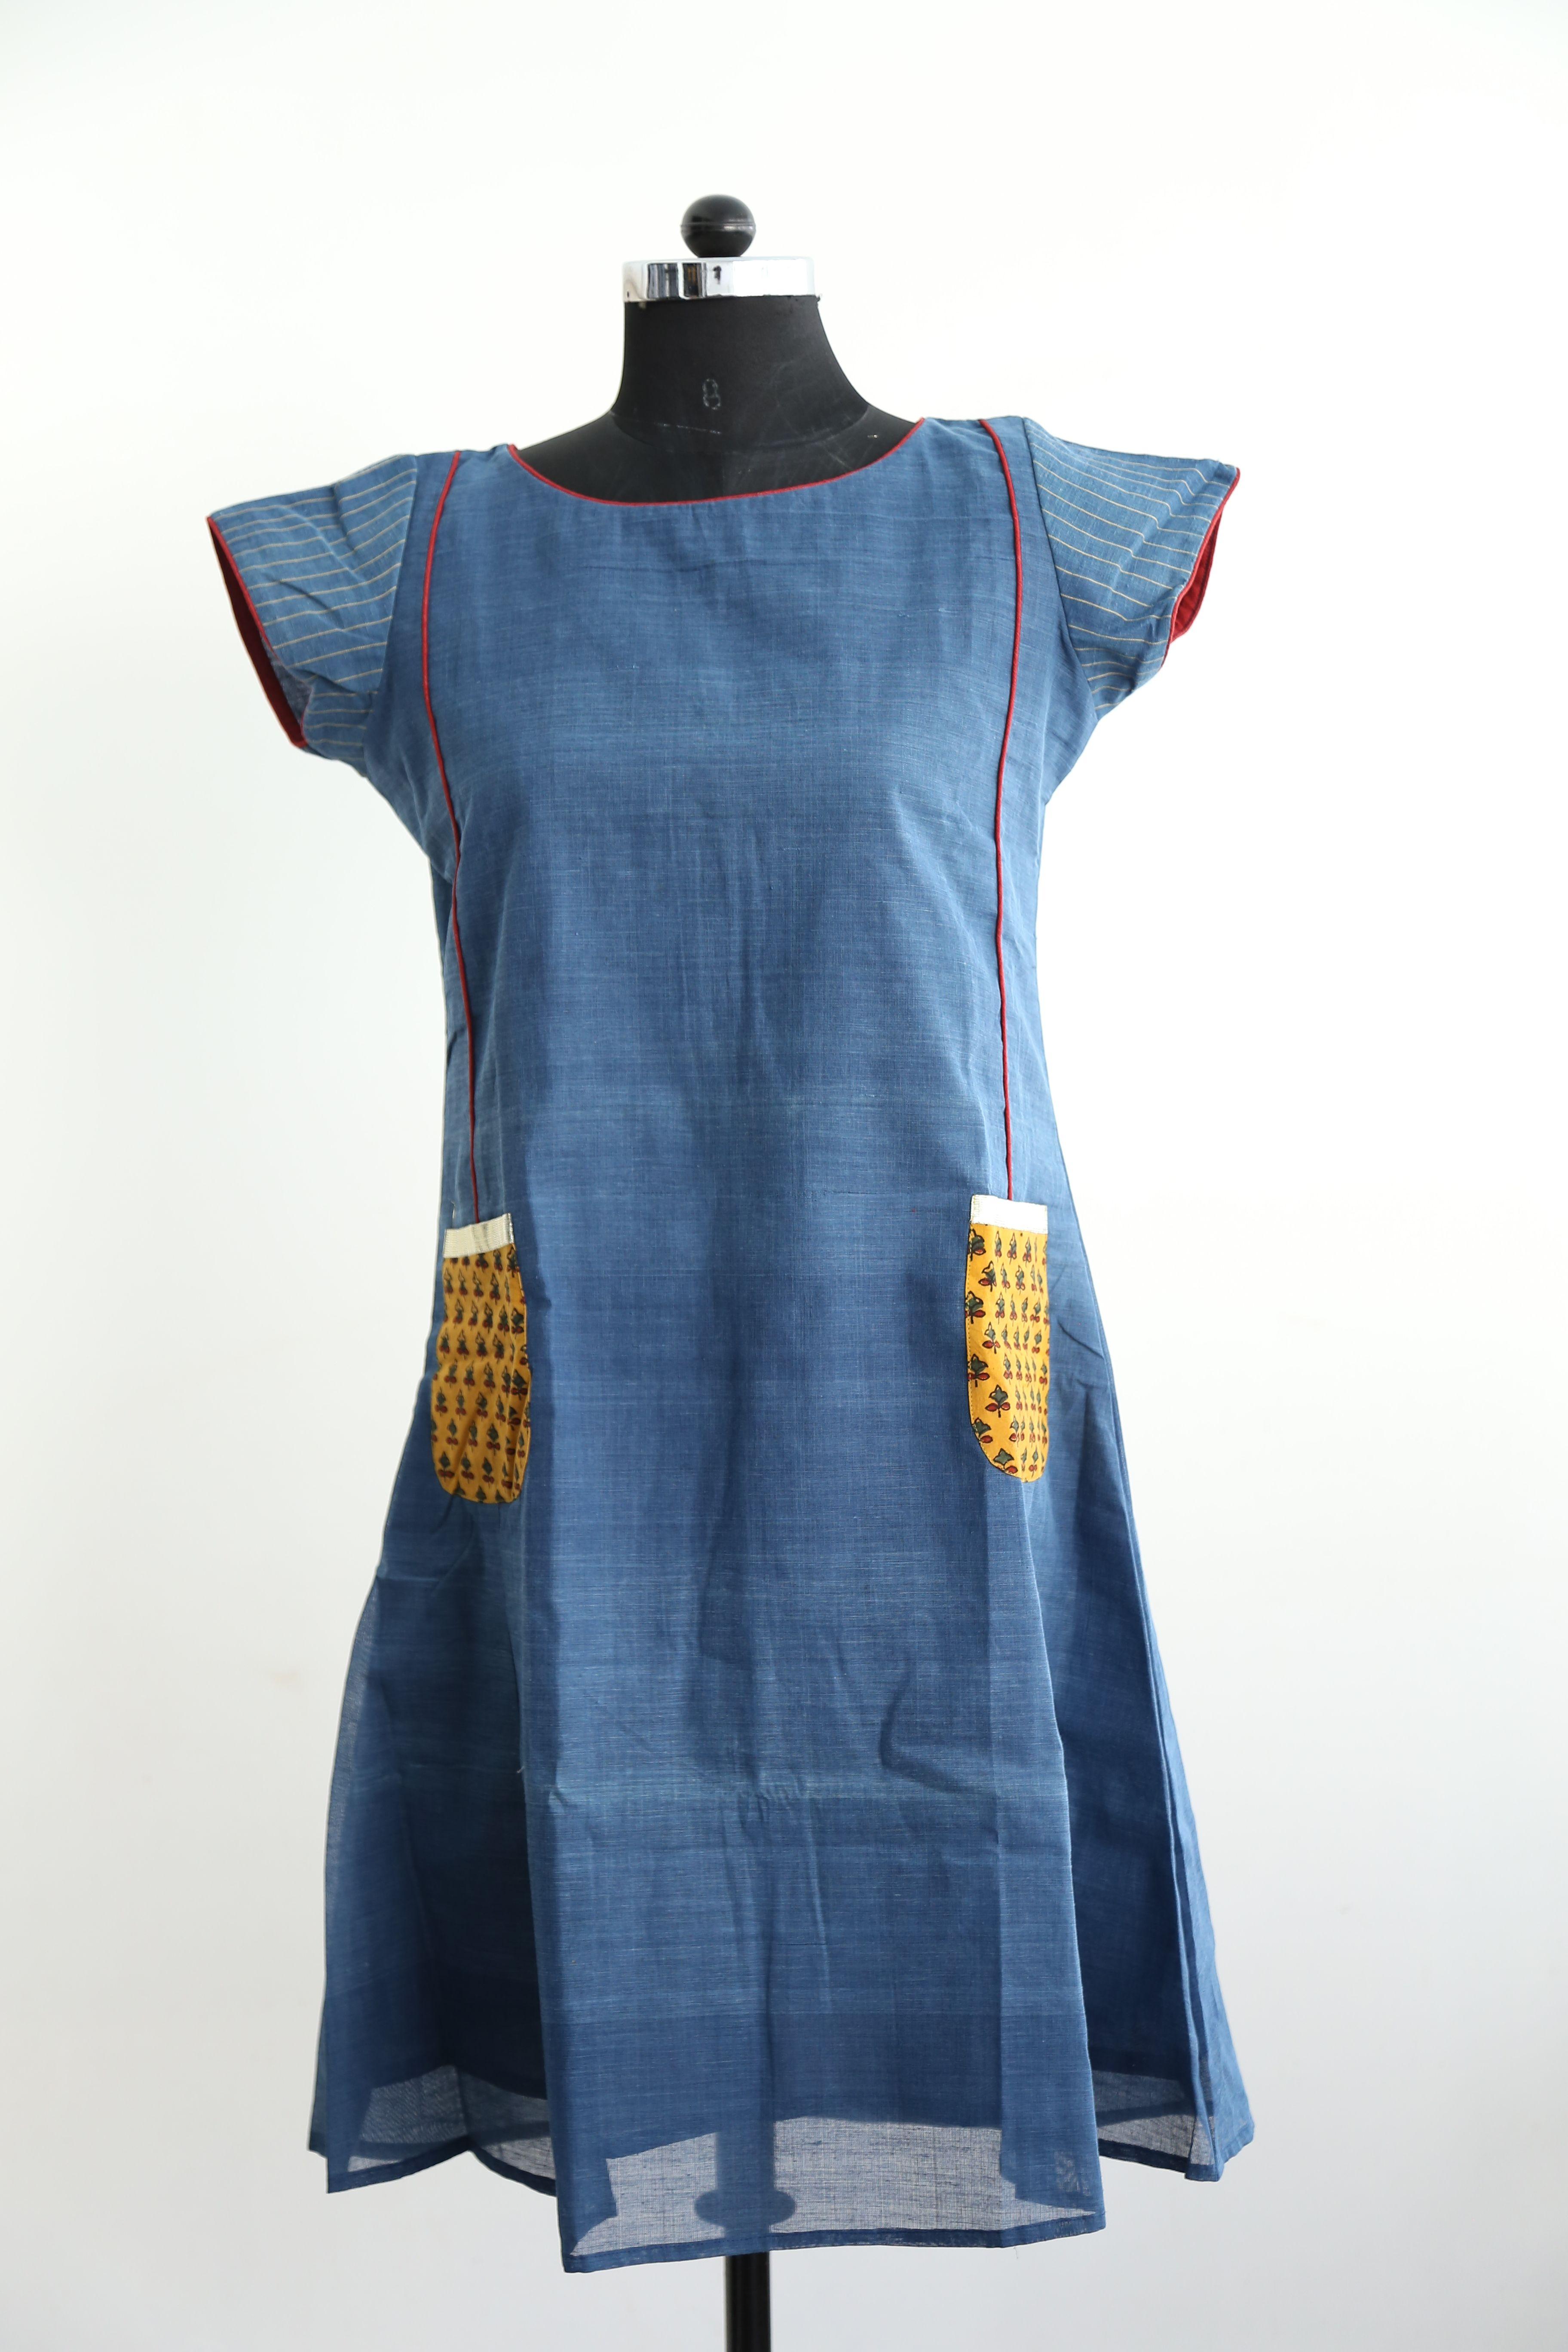 Jamdani Khadi dress